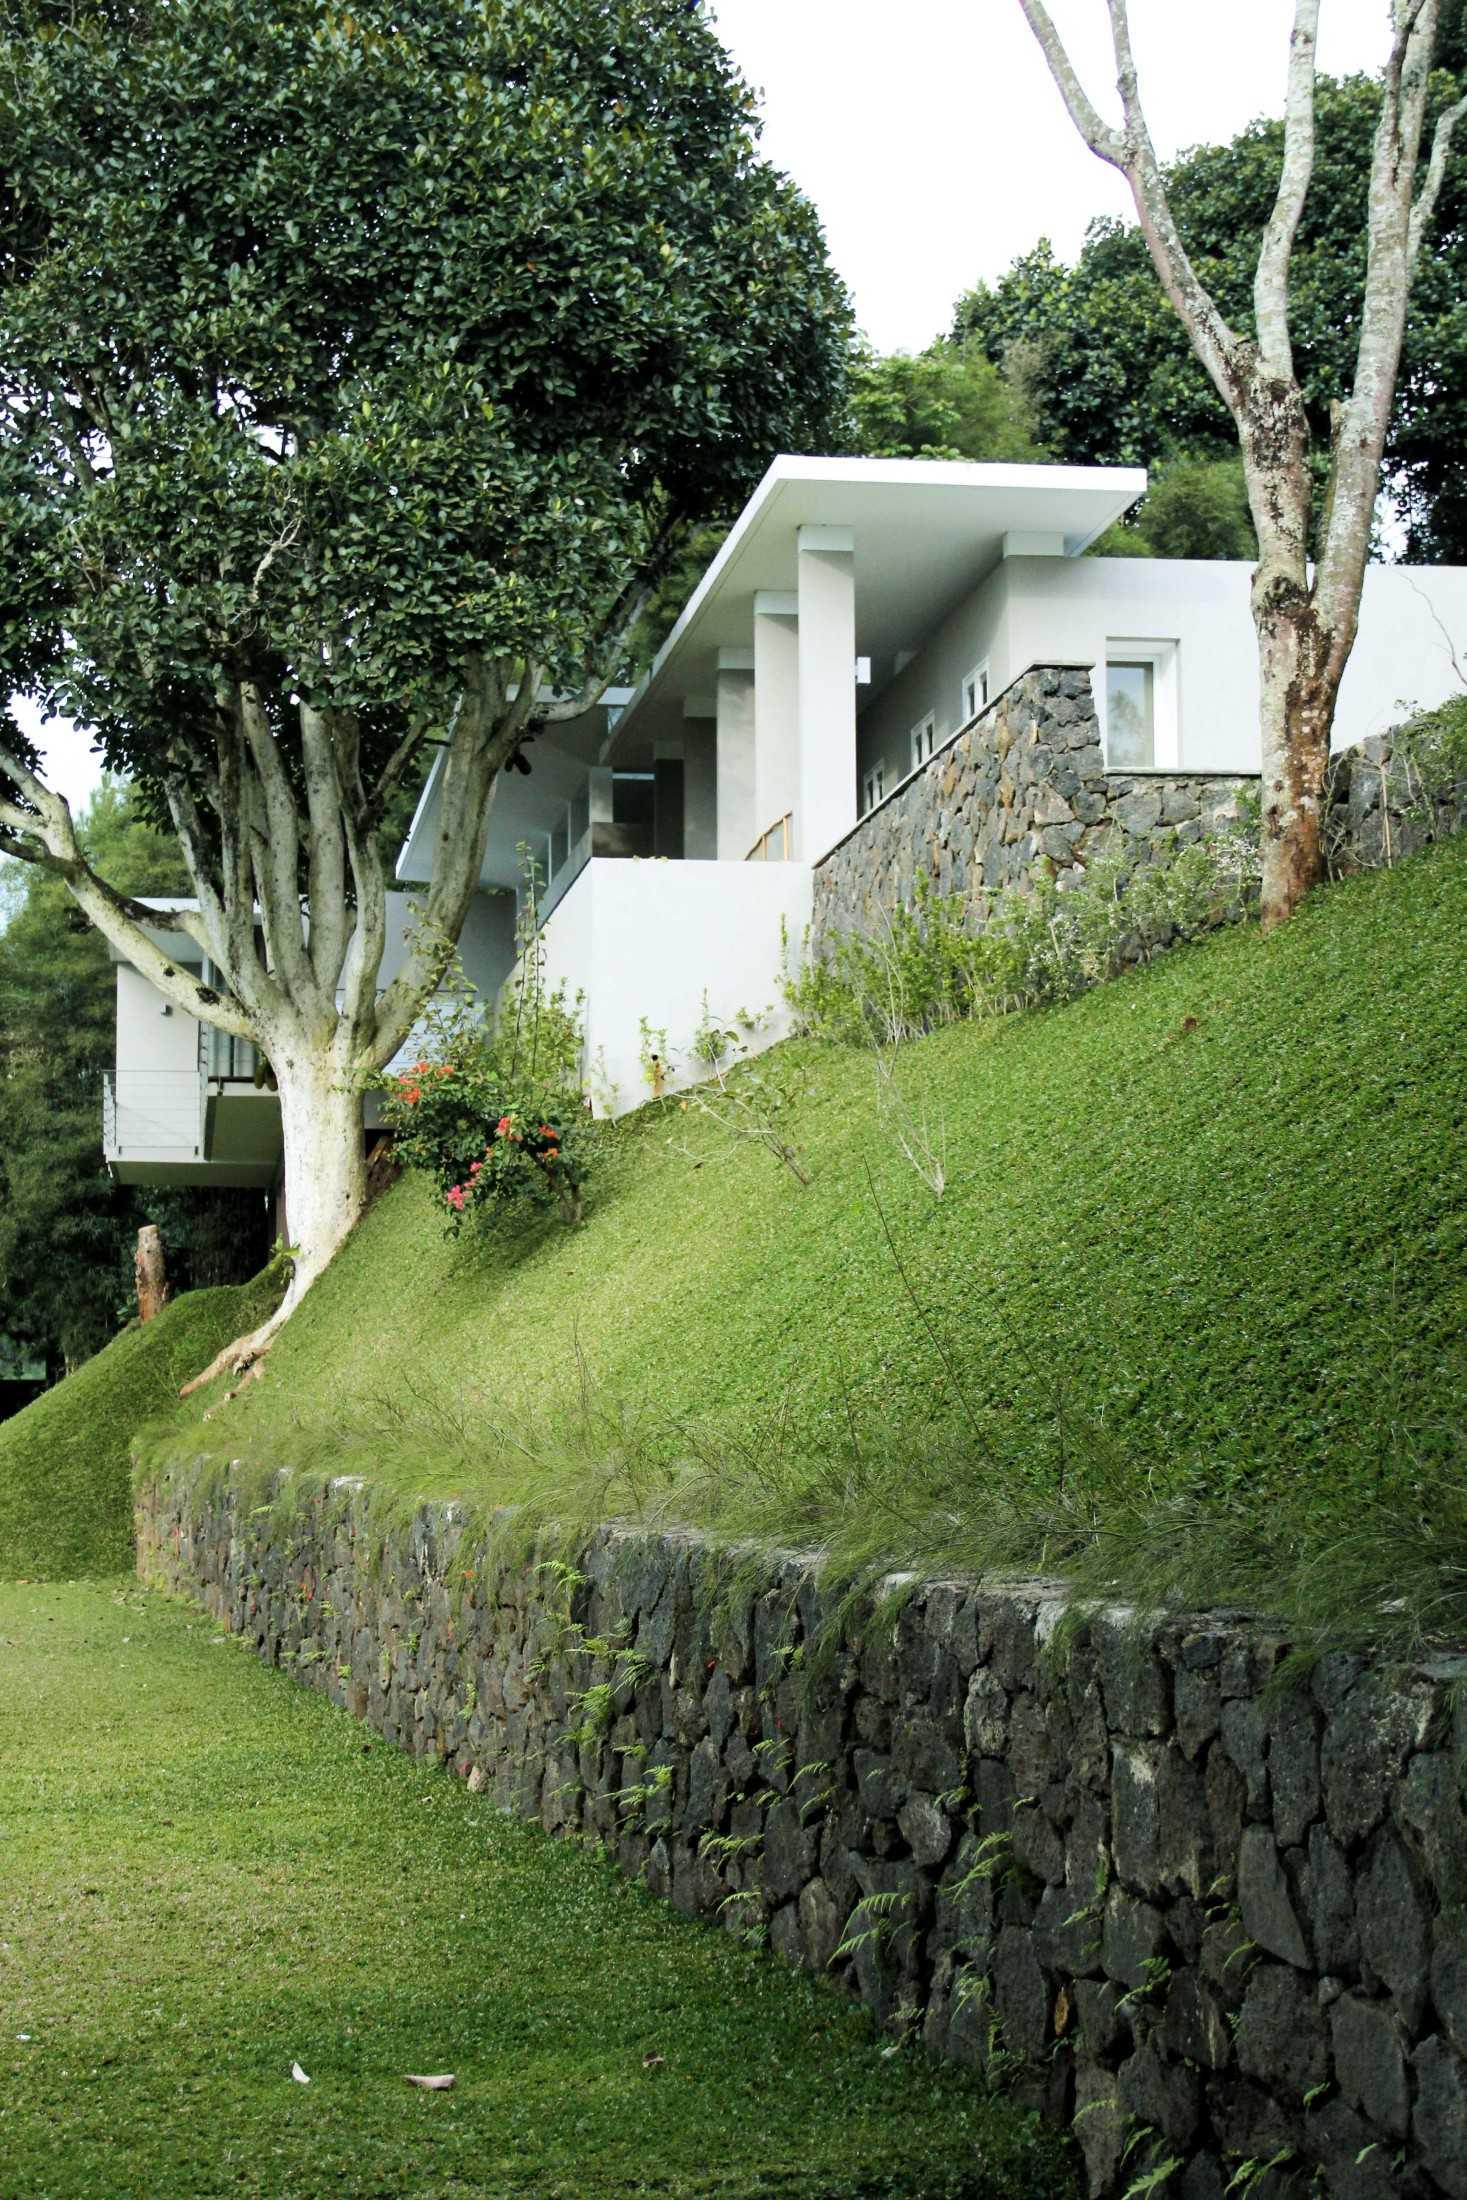 Wastu Cipta Parama Villa Sindangwaas Bandung, Kota Bandung, Jawa Barat, Indonesia Bandung, Kota Bandung, Jawa Barat, Indonesia Eksterior  79117